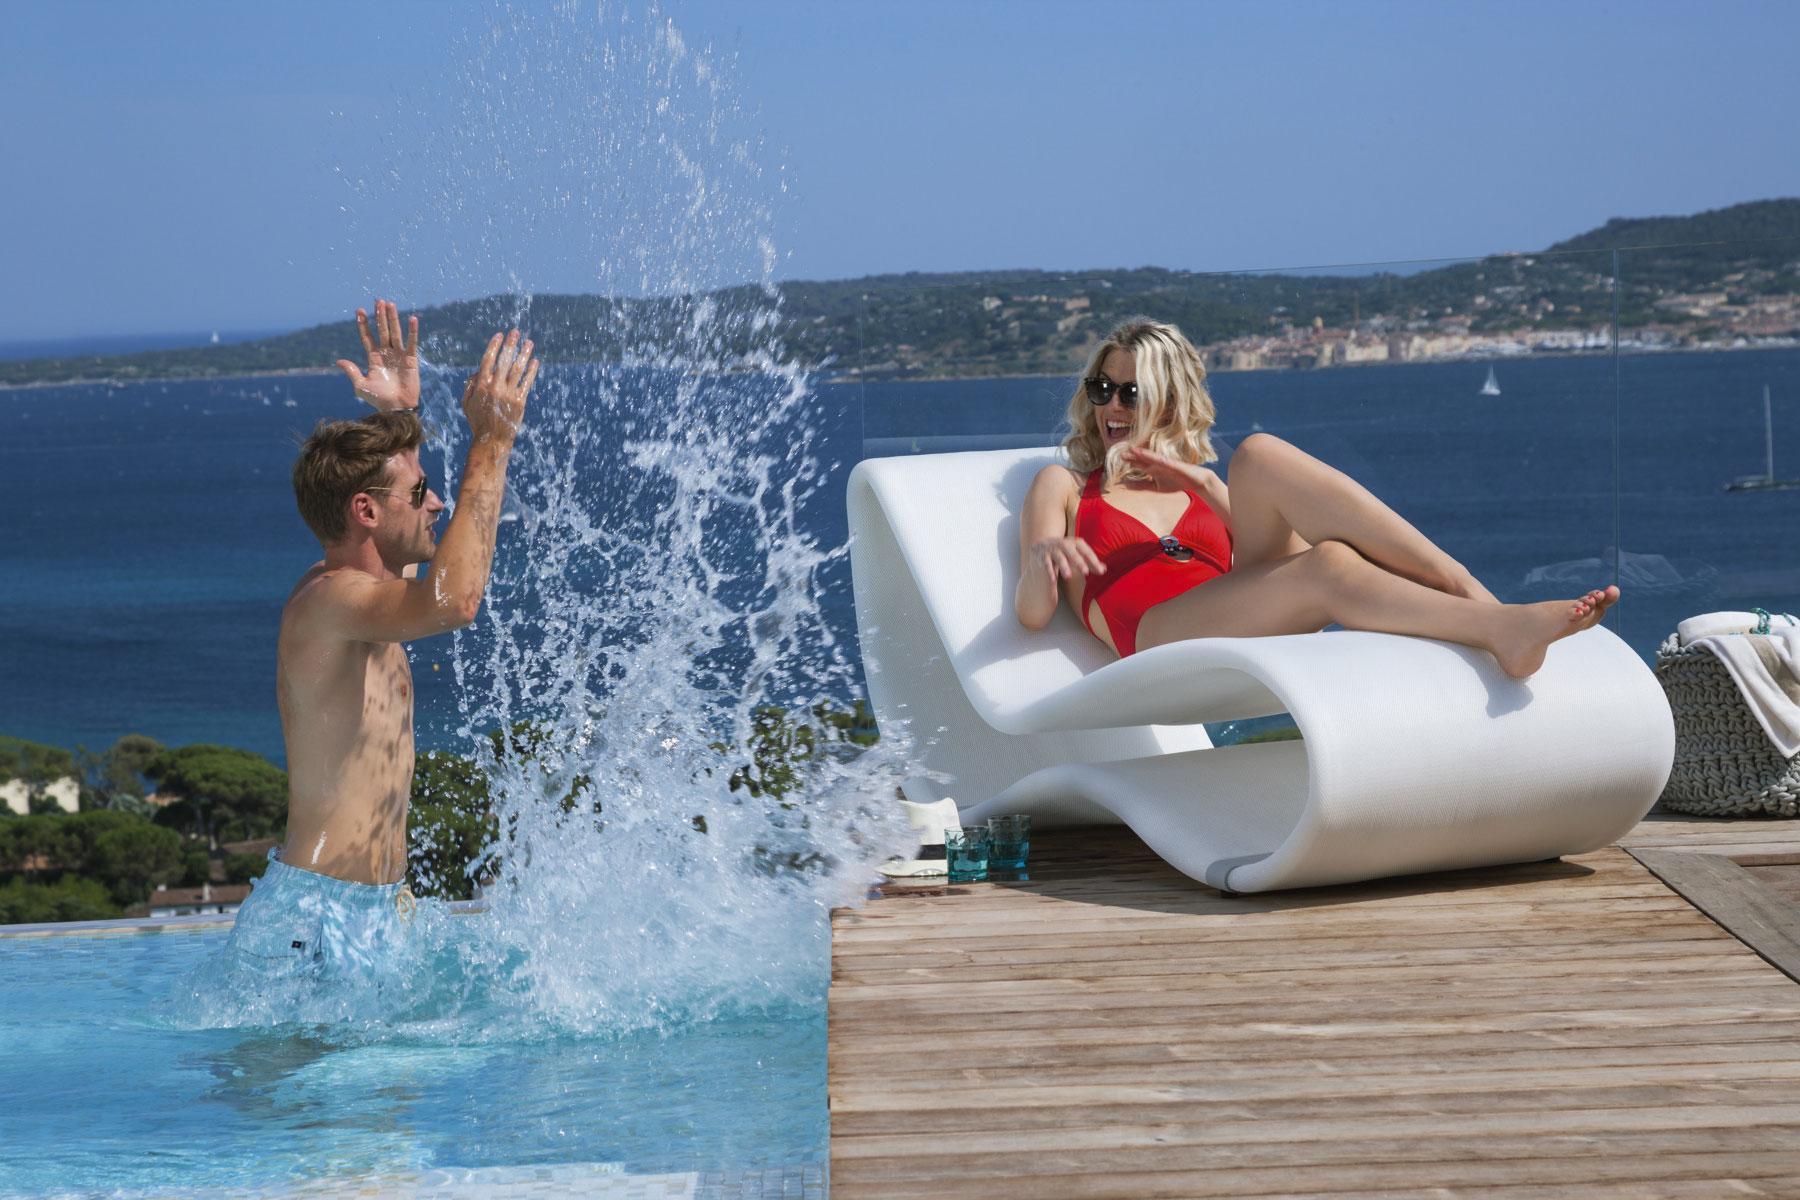 sunbed outdoor chaise longue made in italy manufacturer design garden luxury karim rashid pool garden yacht hotel